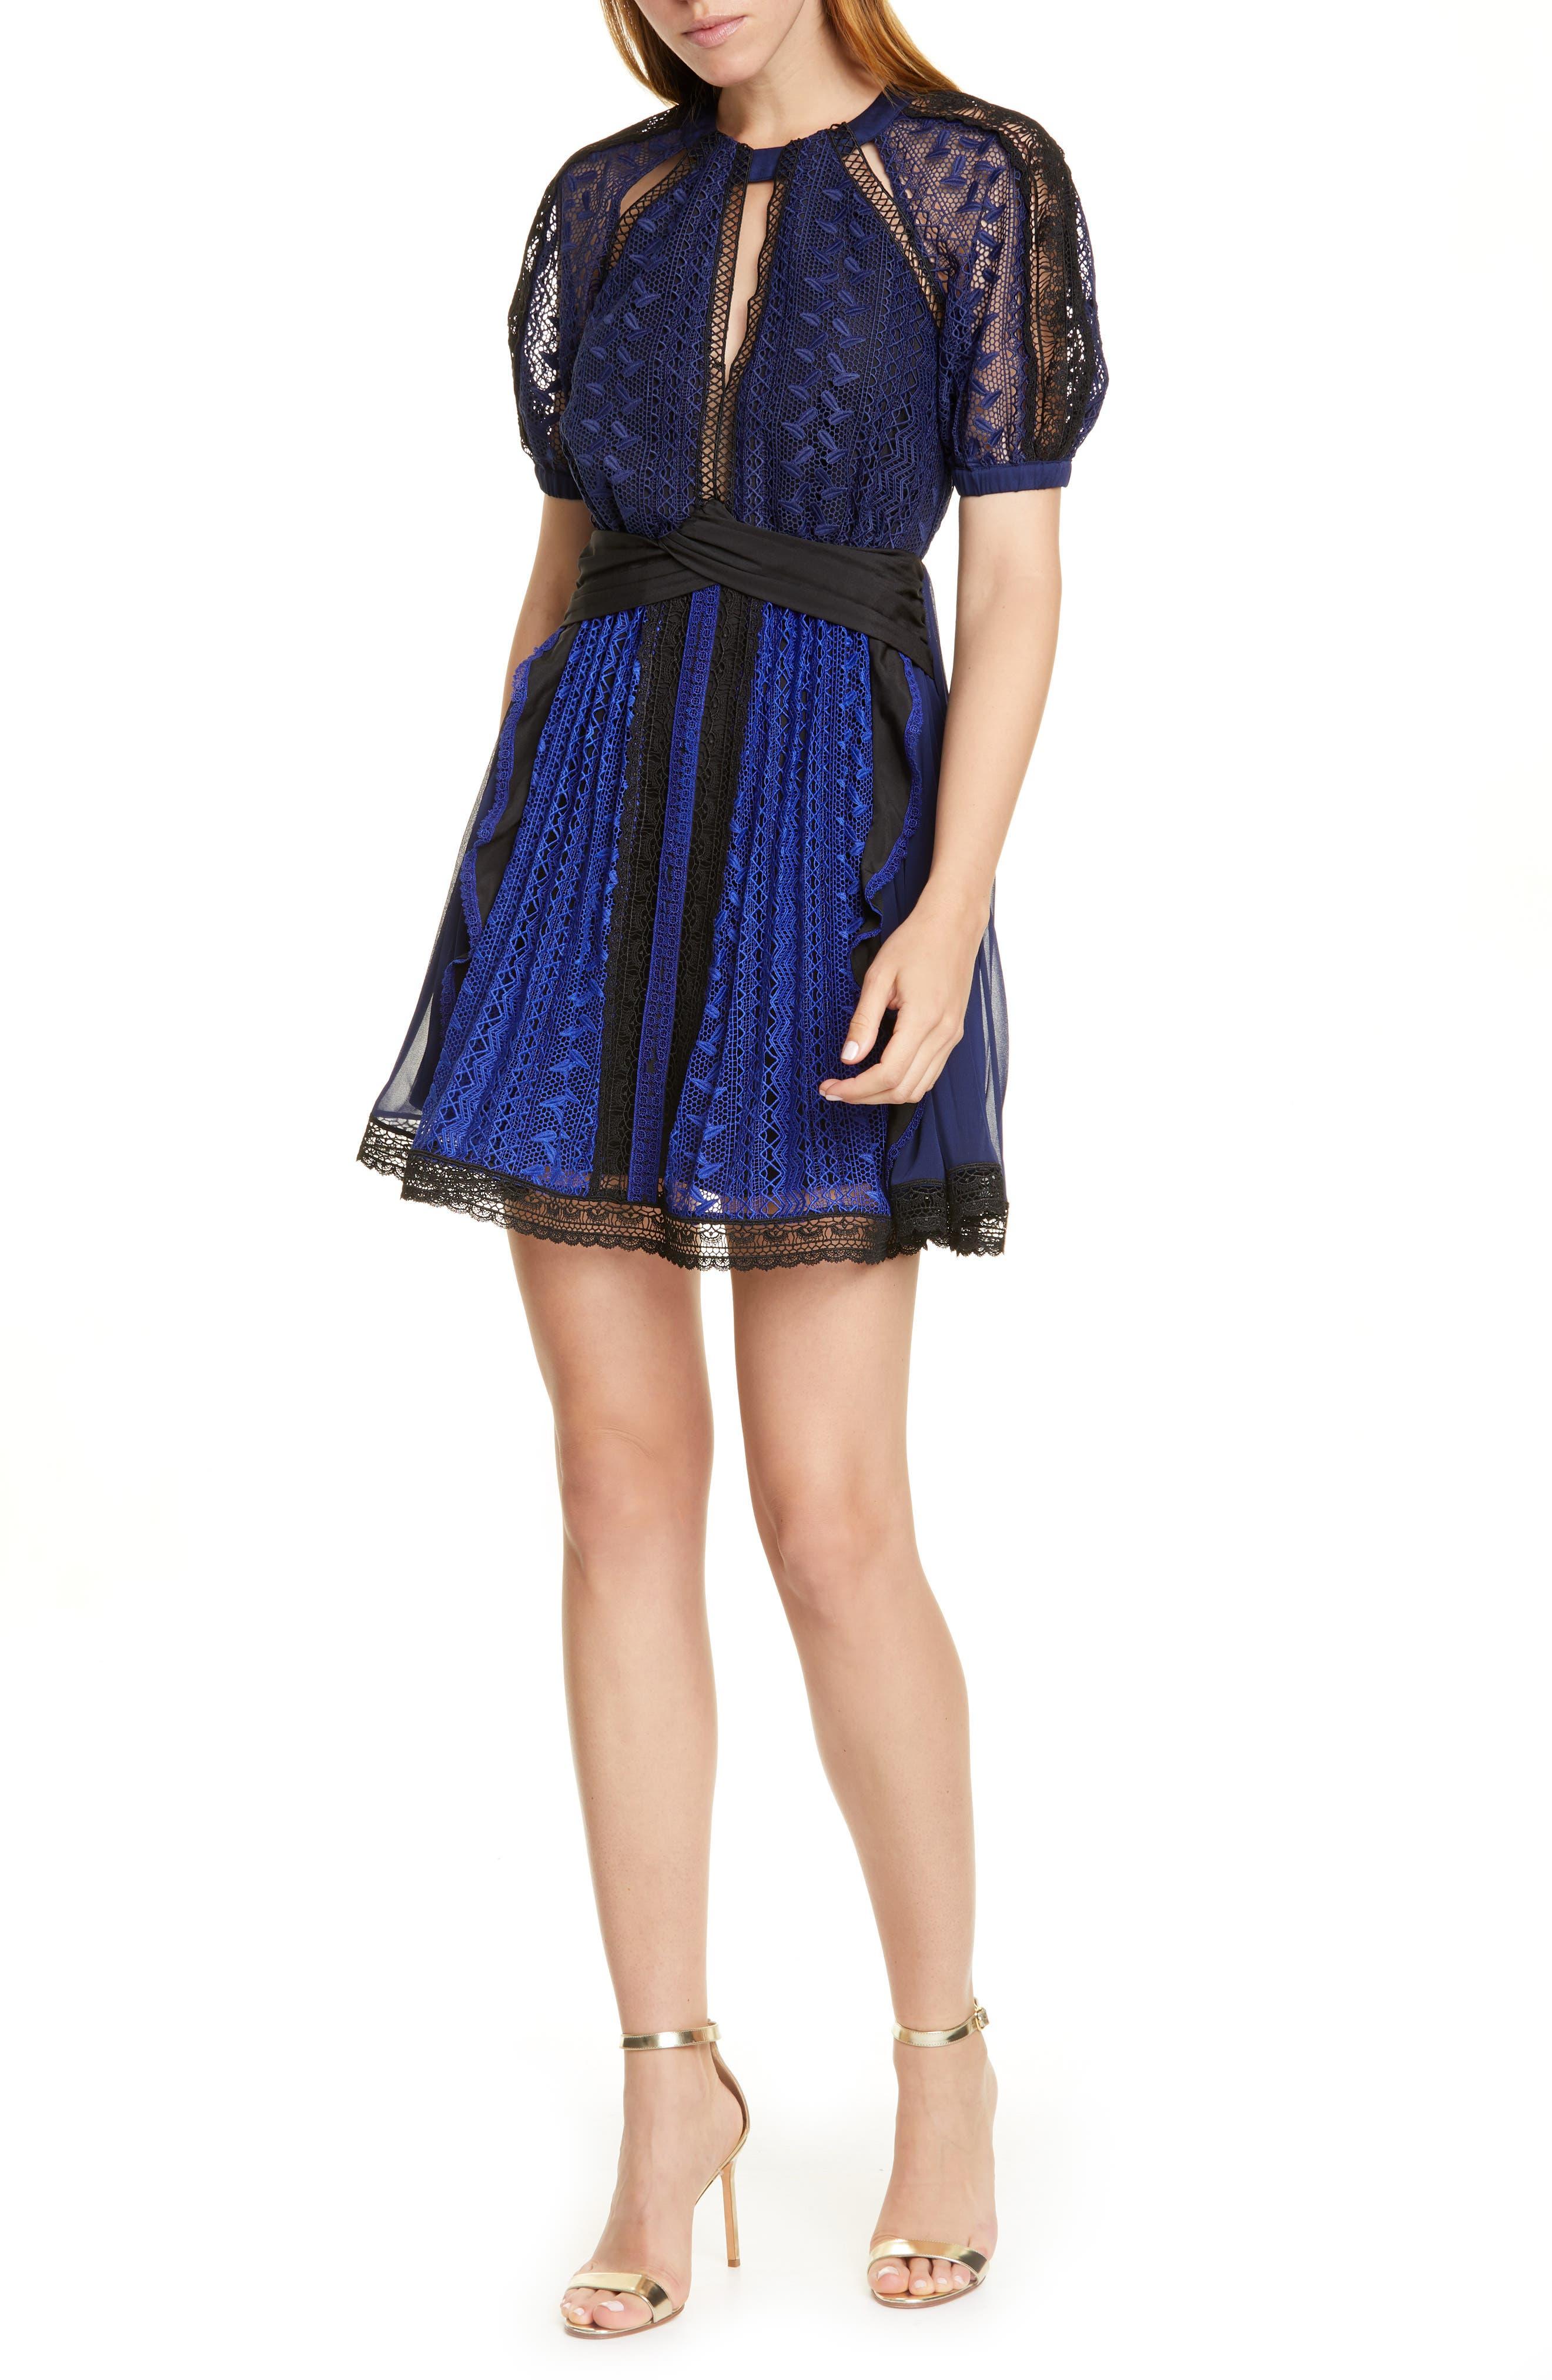 Self-Portrait Dresses Geometric Lace Minidress